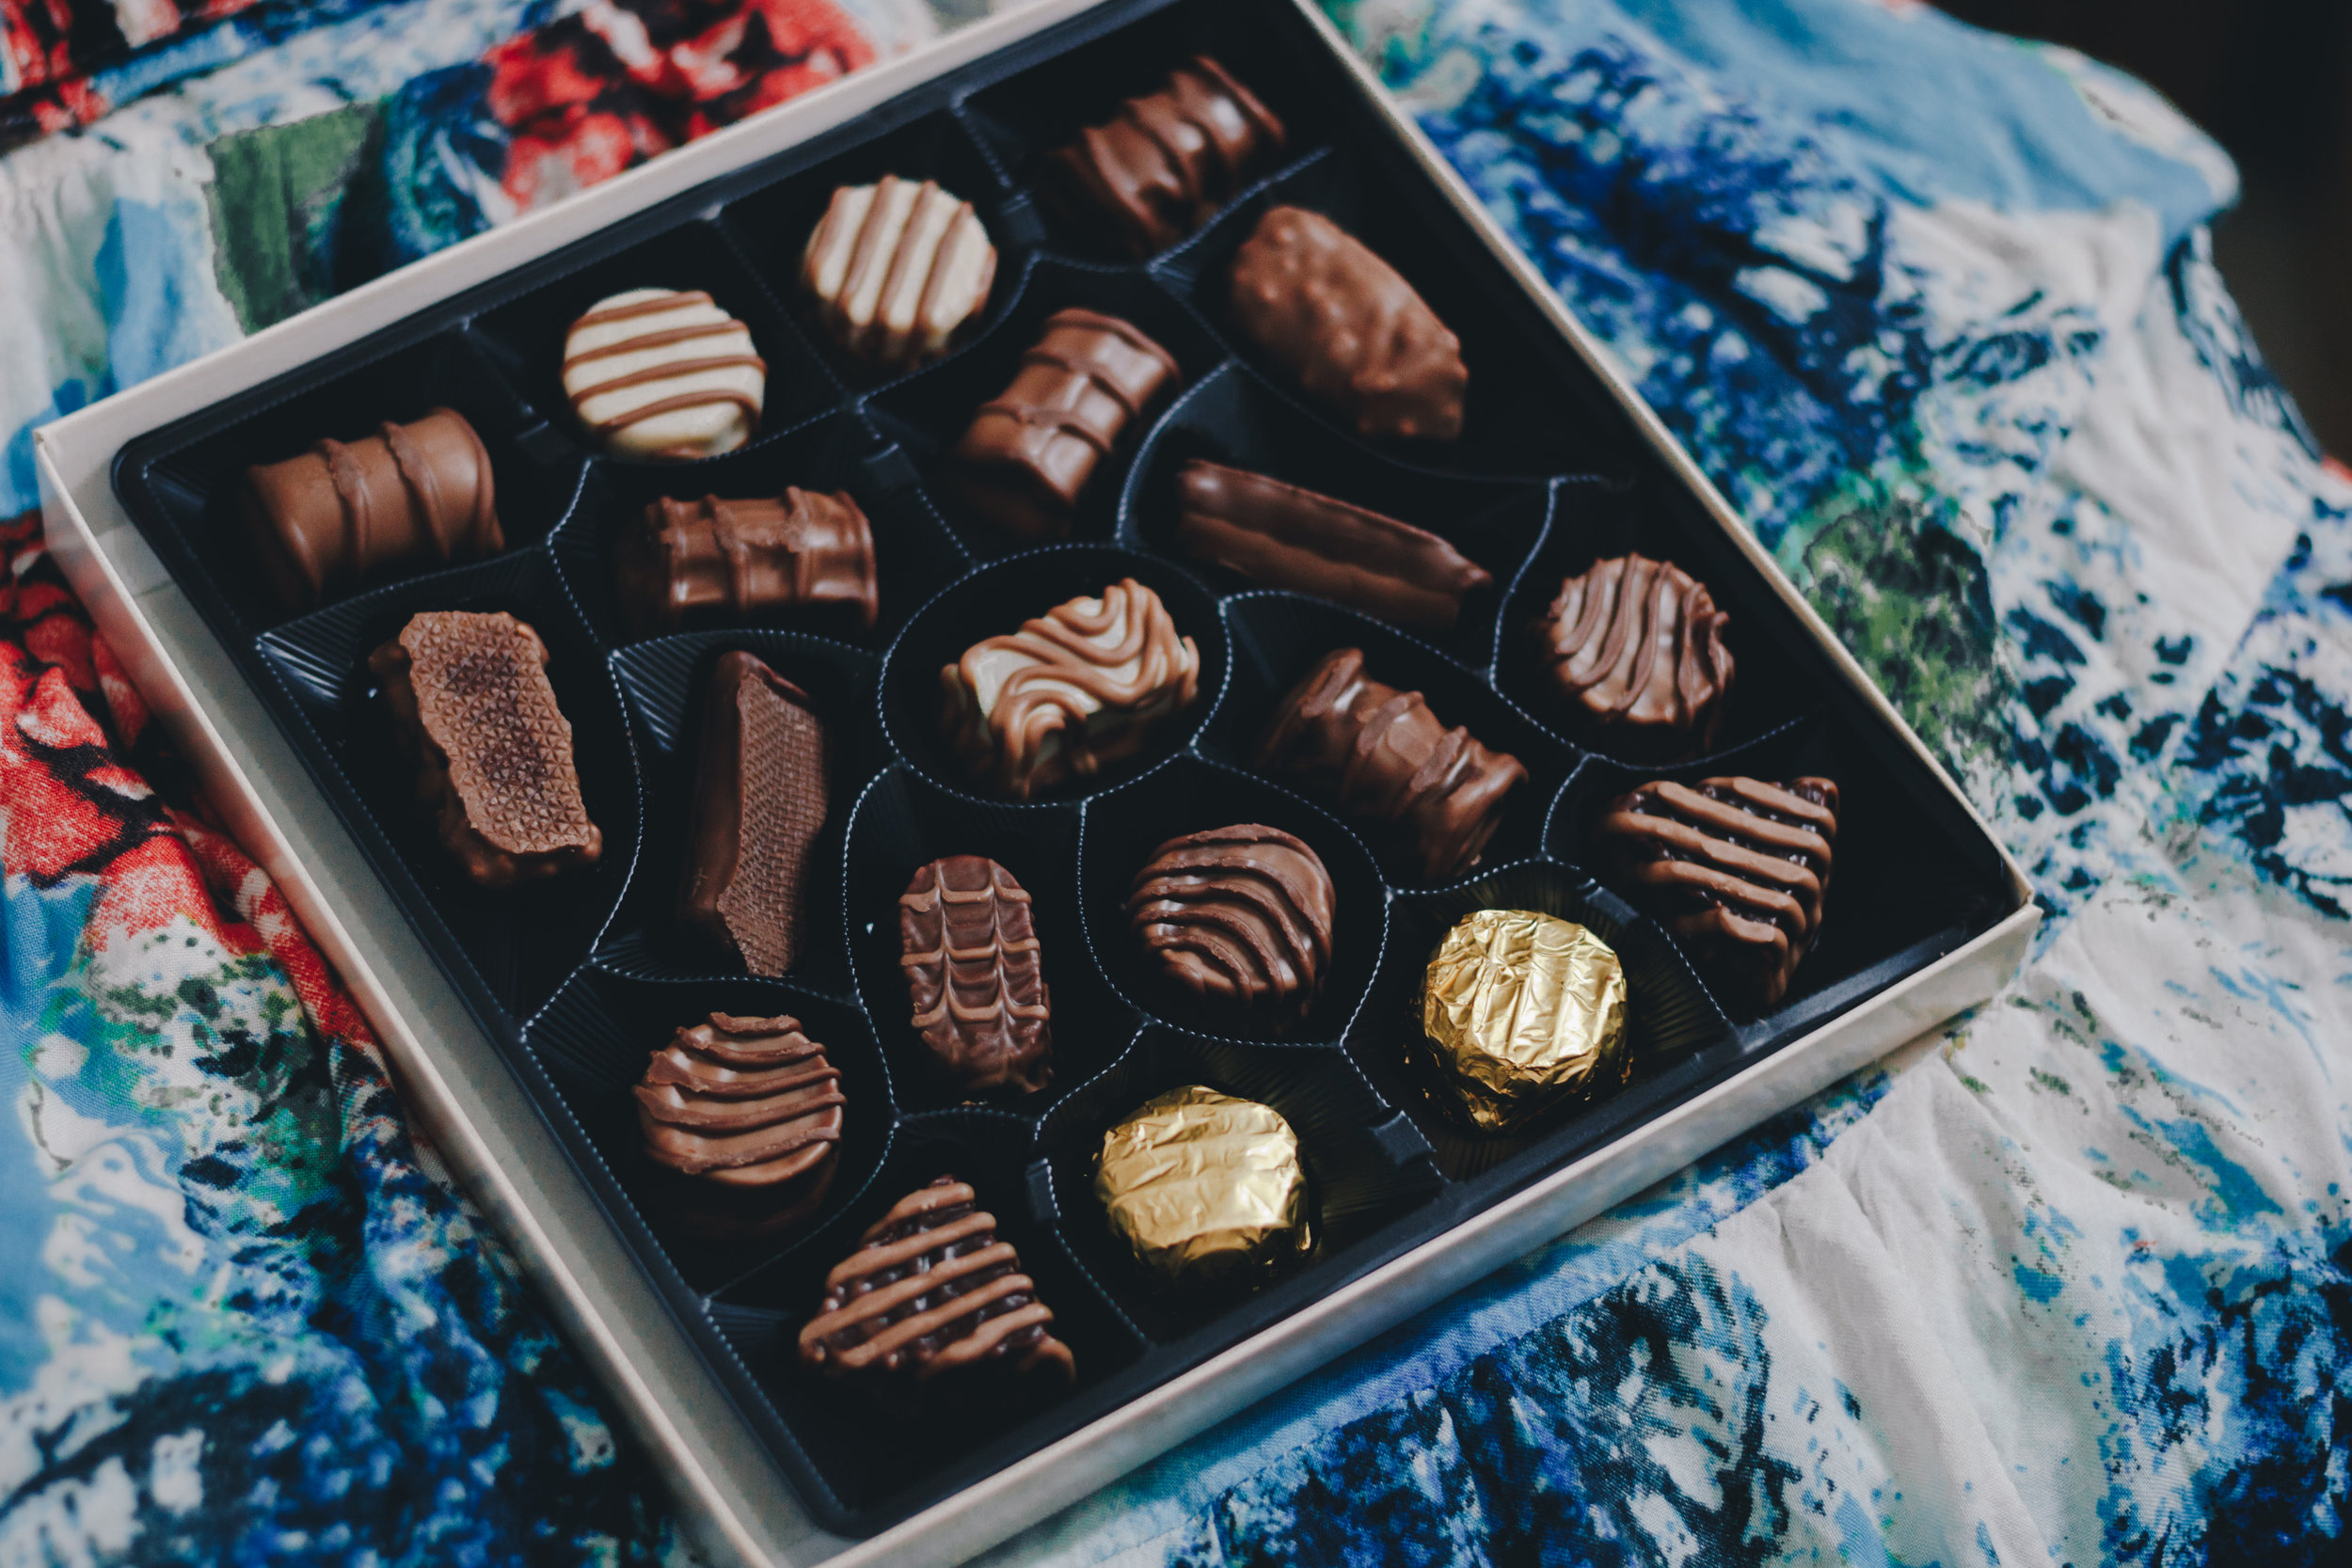 Chocolate Extravaganza - February 2020 date TBA